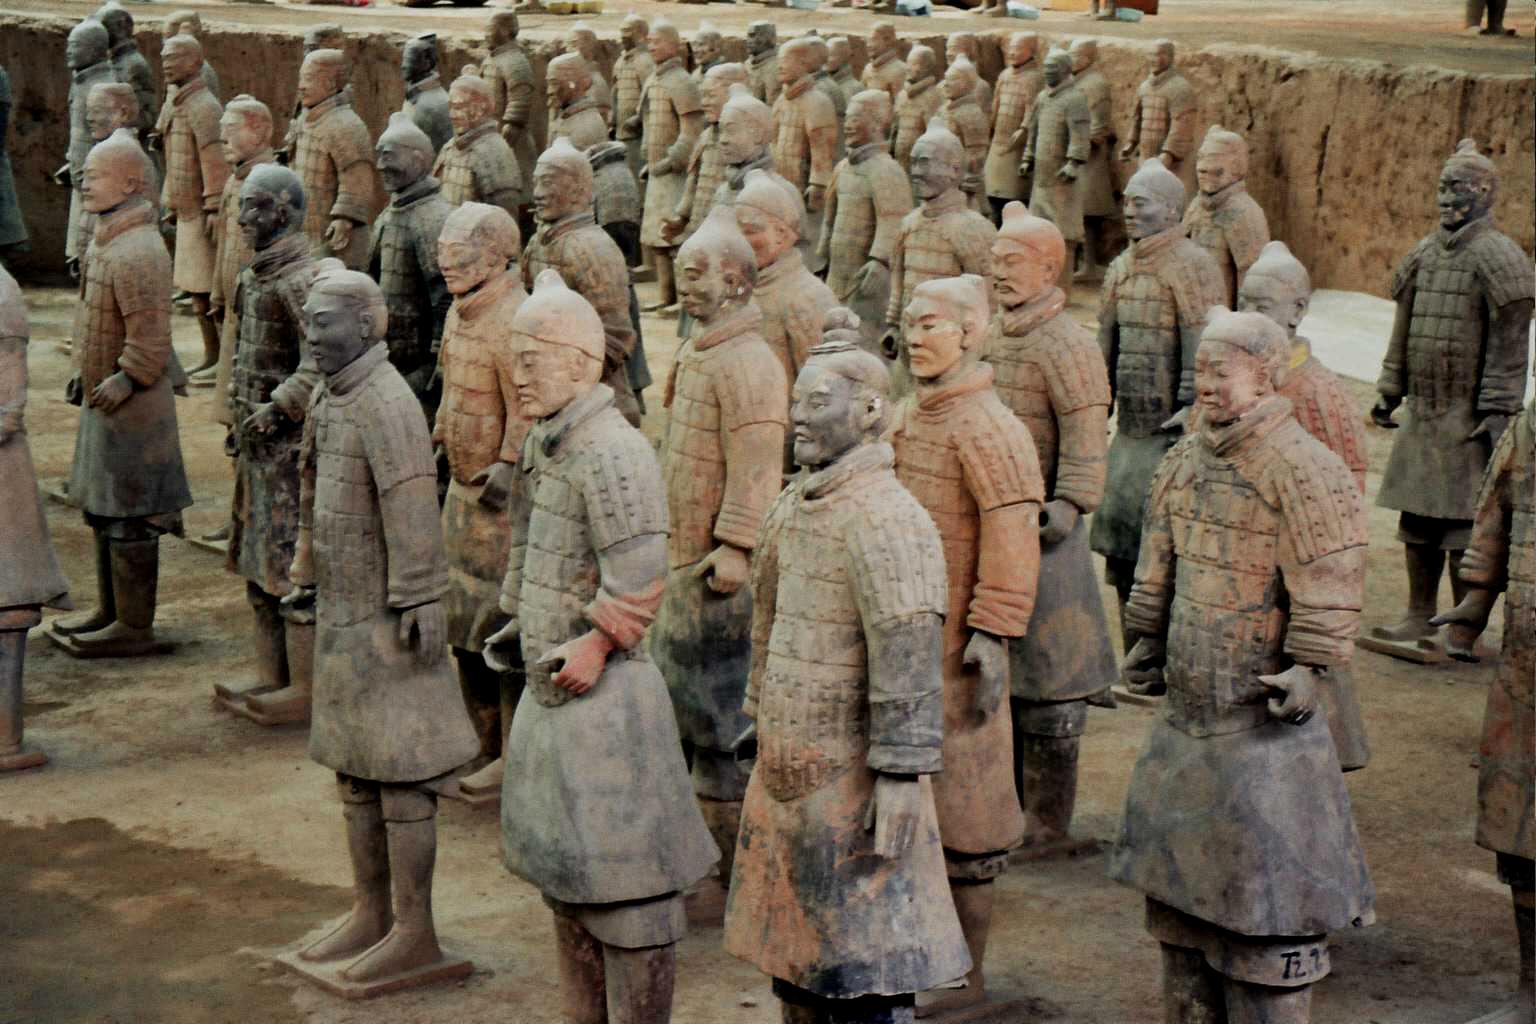 Lista del Patrimonio Mundial. - Página 2 Xian_guerreros_terracota_detalle